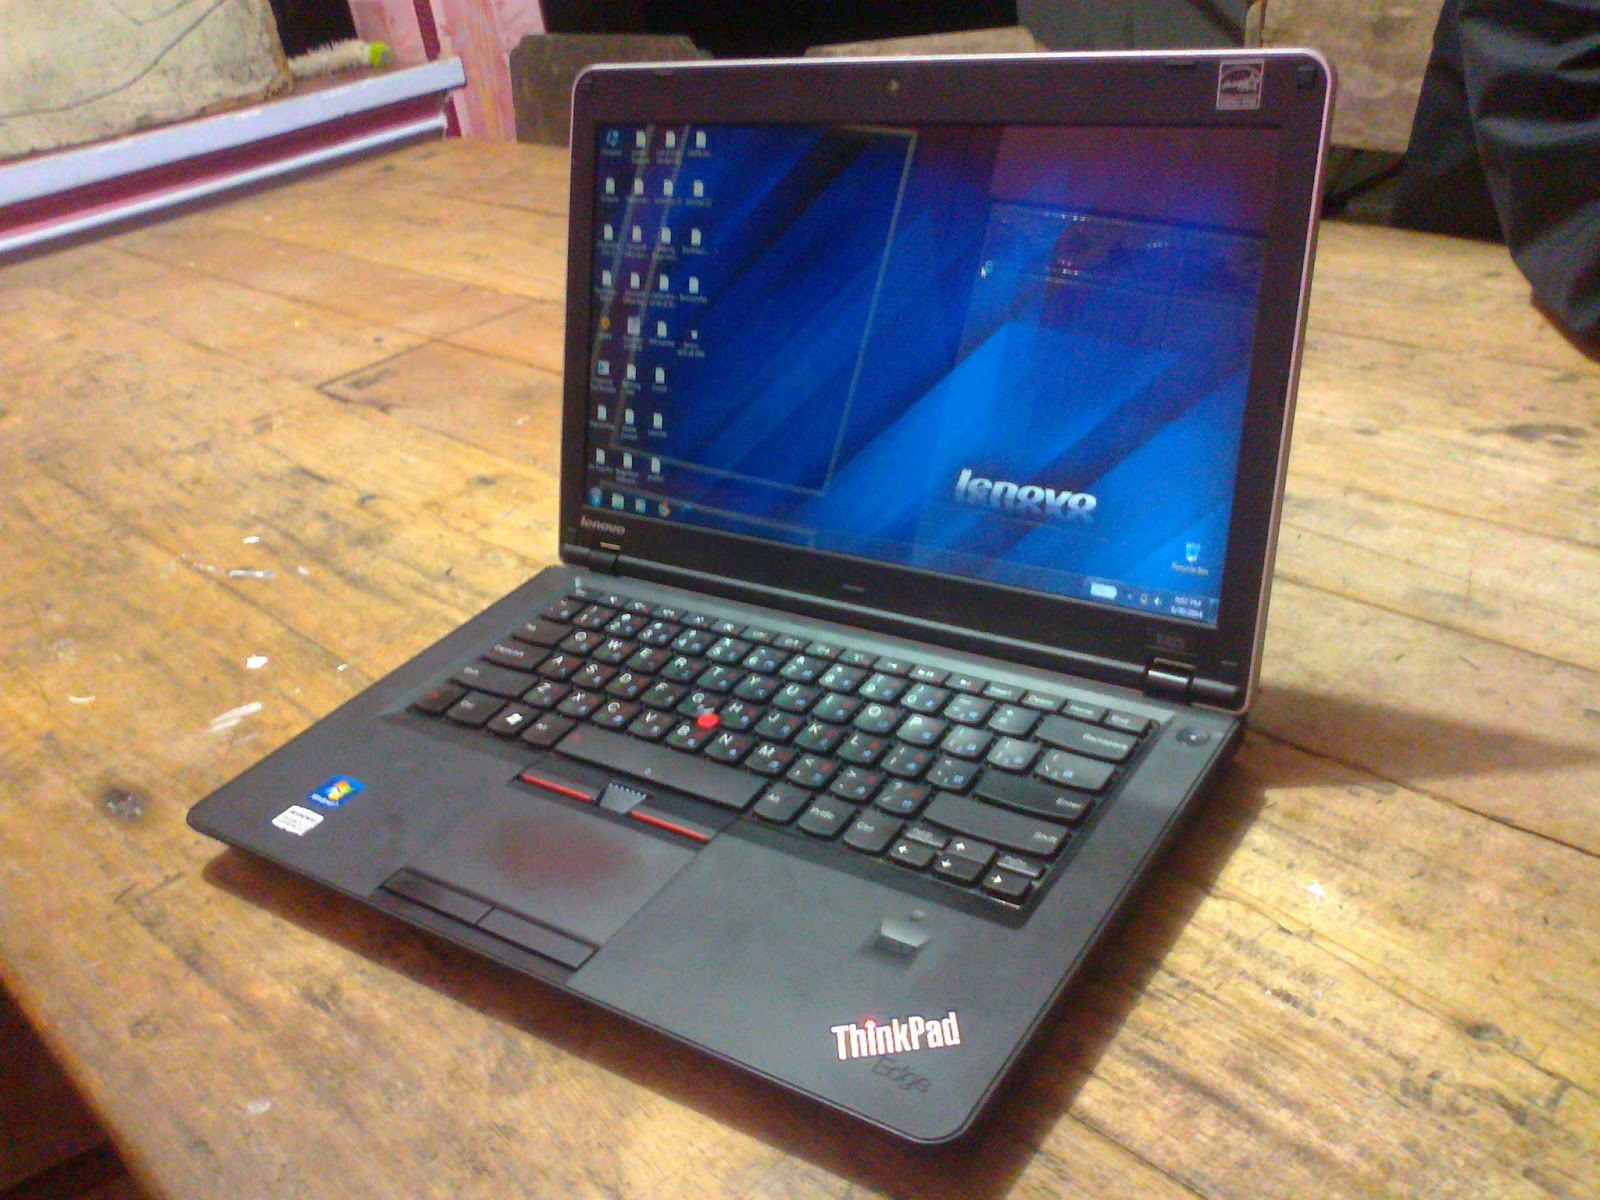 Spesifikasi Lenovo Thinkpad E425 AMD A8 3500M 1 5 GHz RAM 4 Gb DDR3 HDD 750 Gb SATA Dual Radeon HD VGA Radeon HD 6620G 1 5 Gb